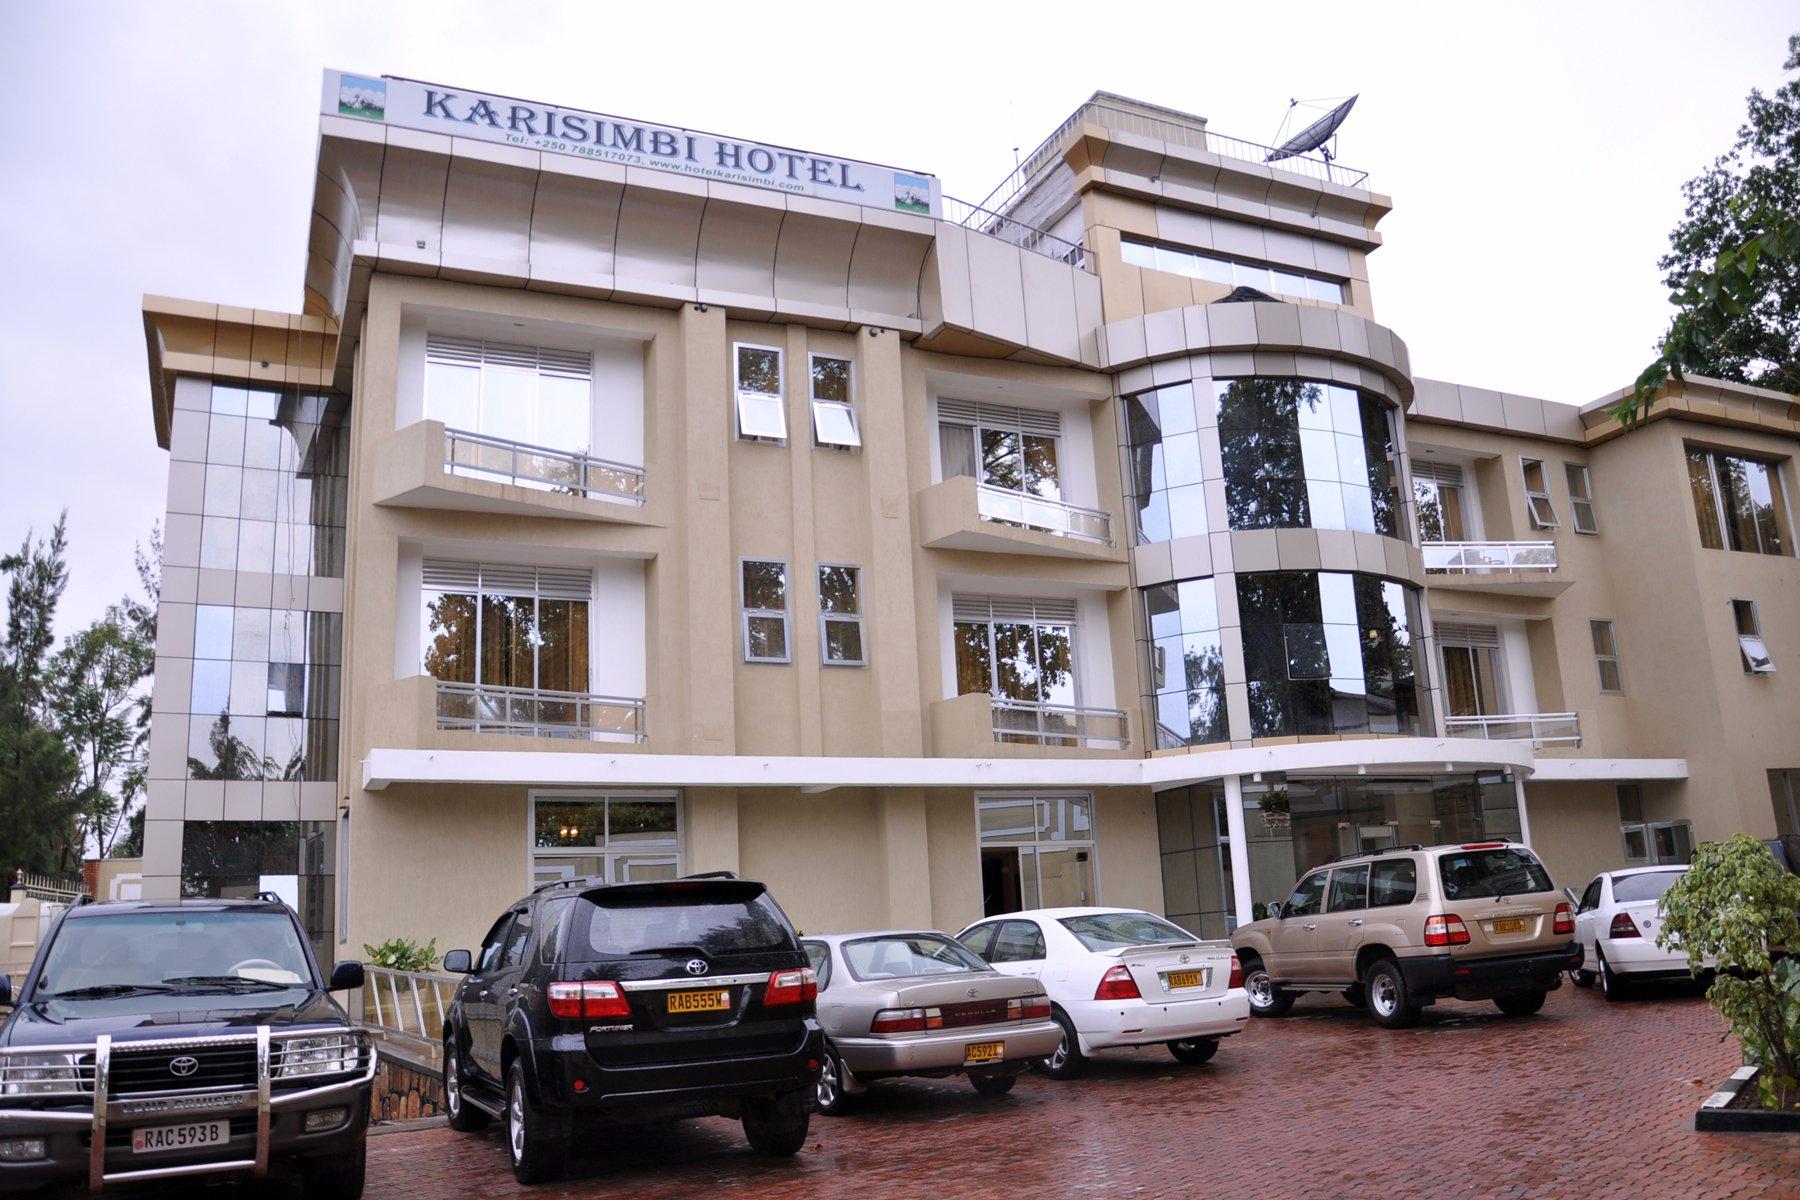 Hotel Kasirimbi